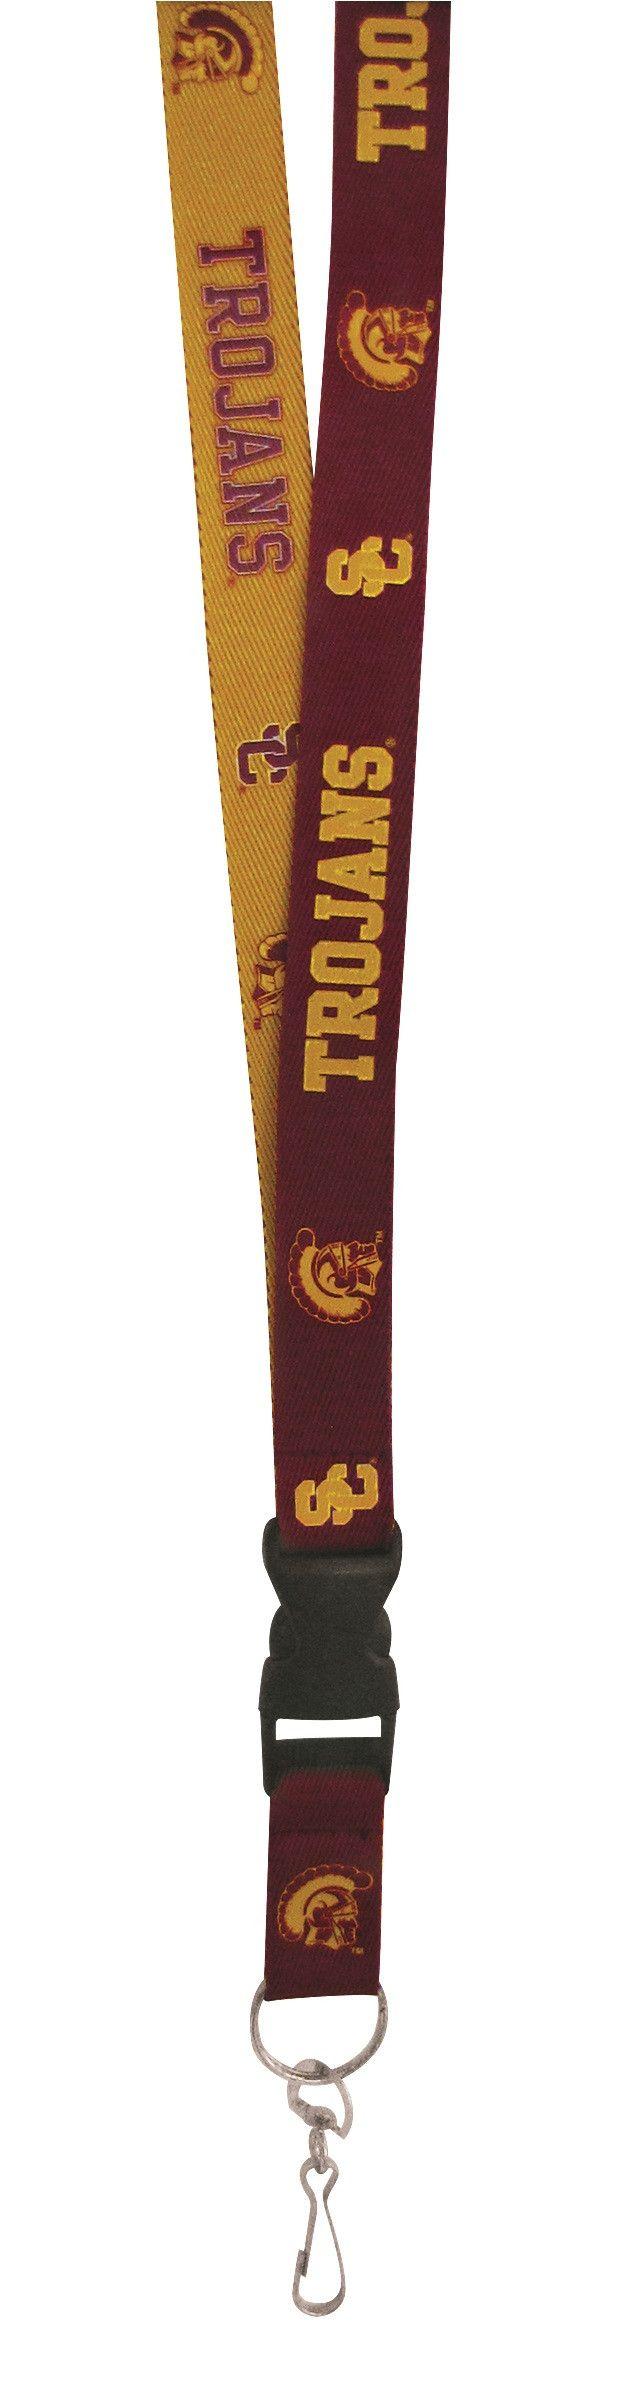 USC Trojans Lanyard - Two-Tone